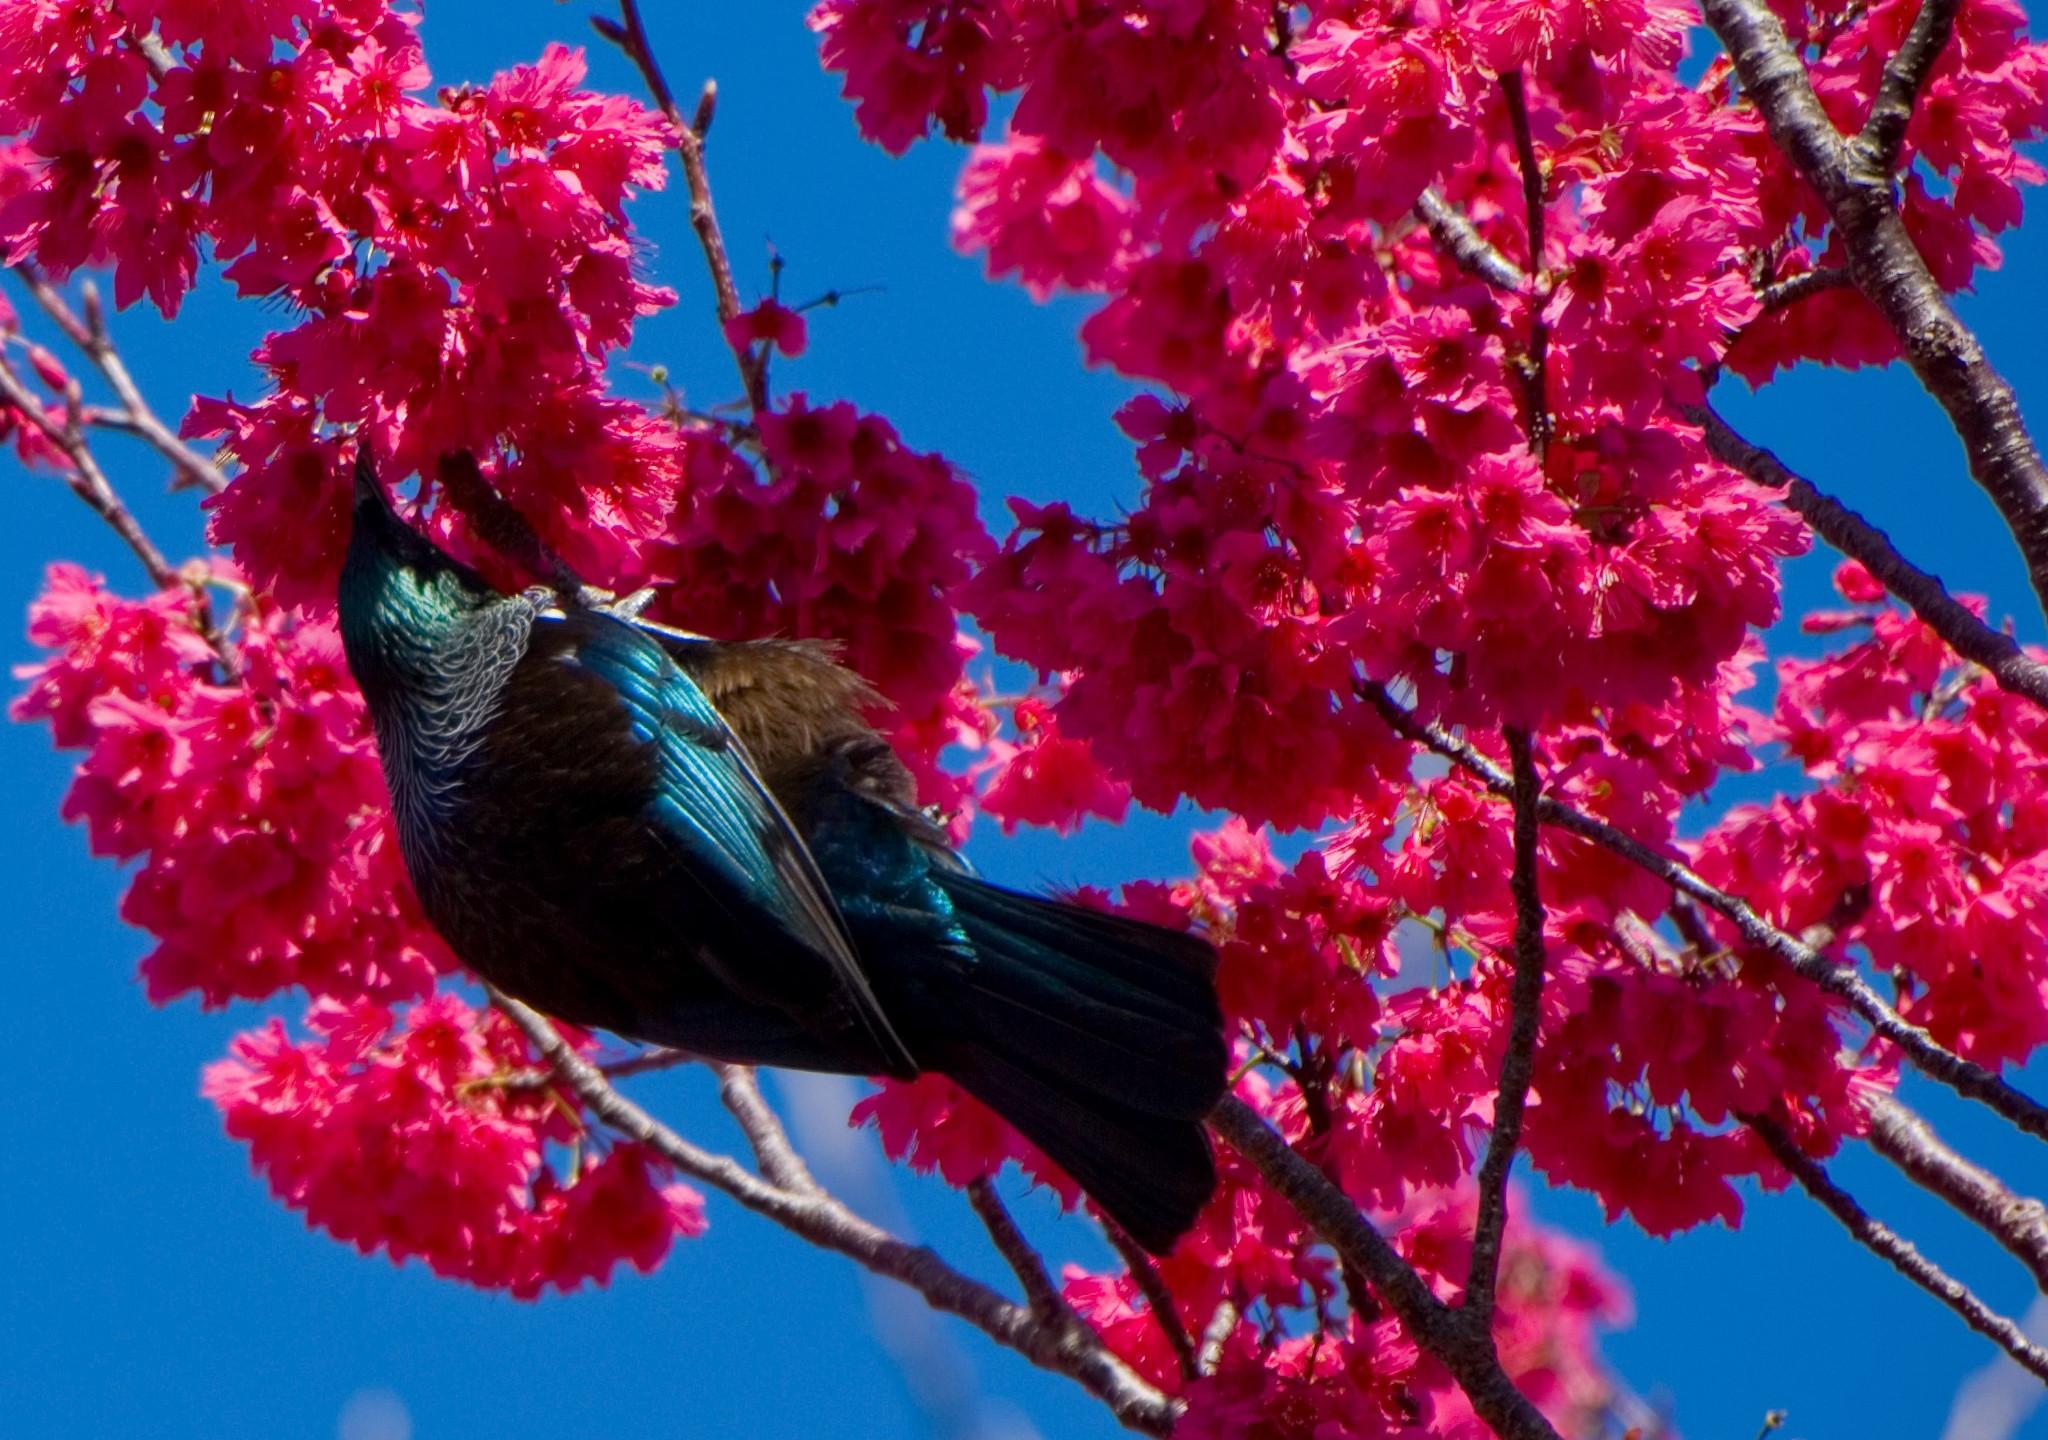 Tui on Waiheke island, Auckland, New Zealand attractions, New Zealand activities